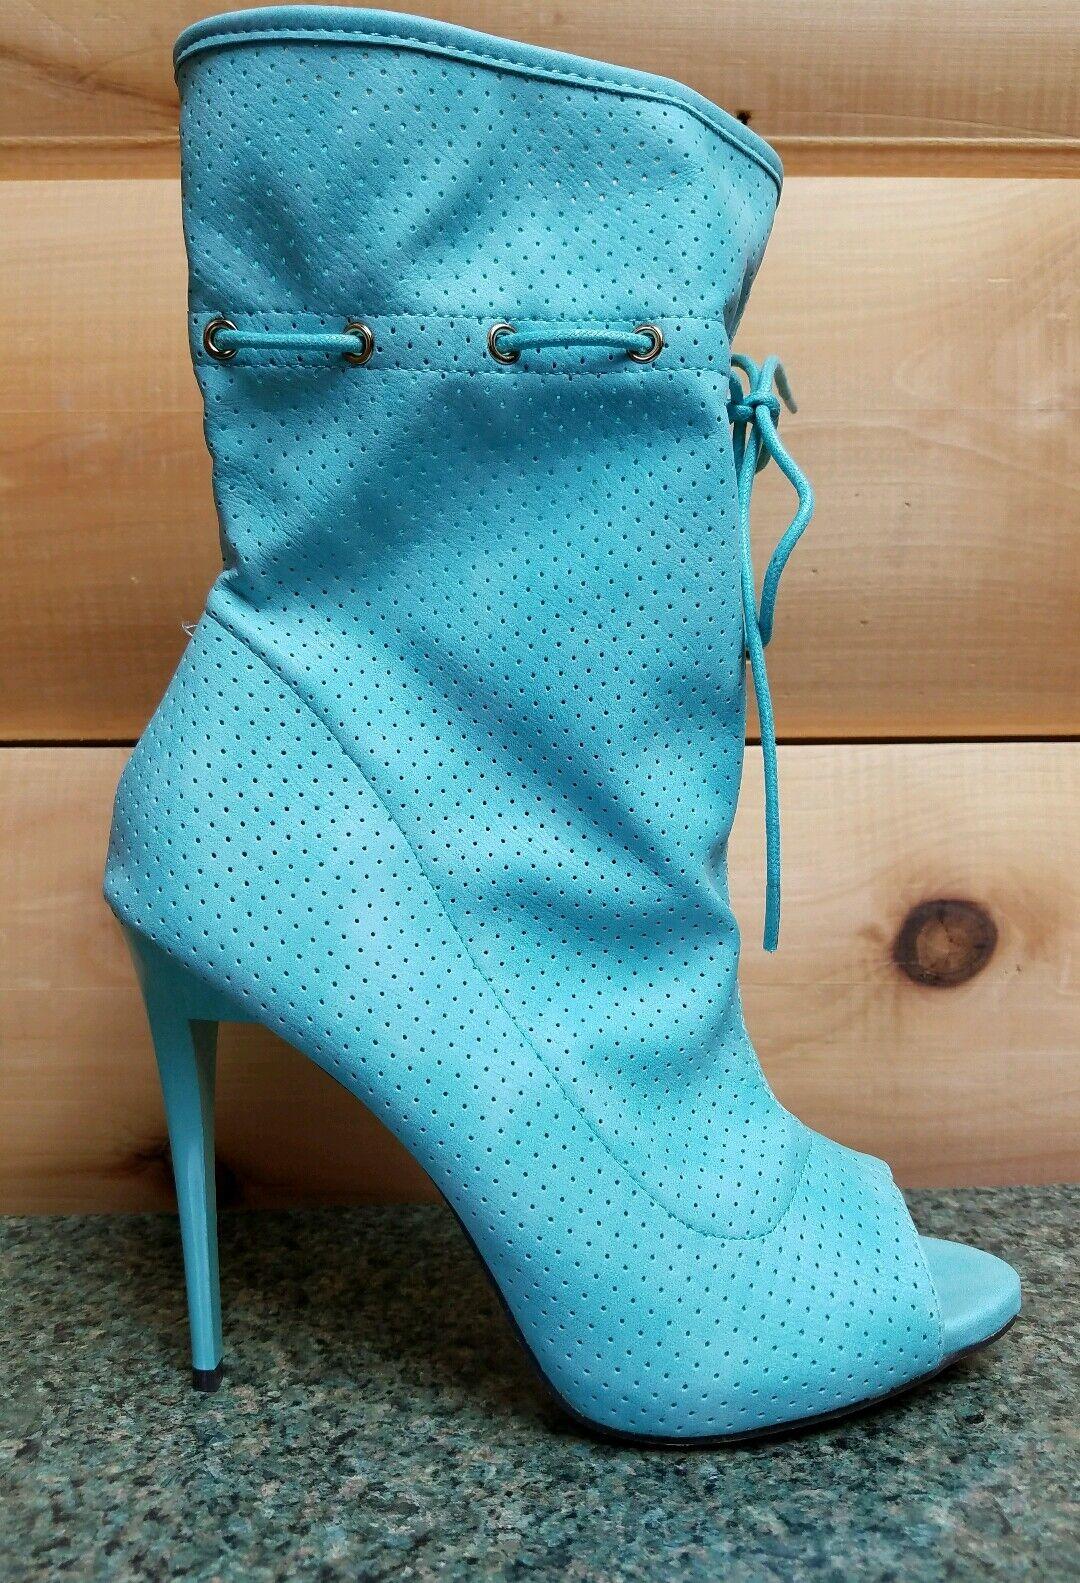 Mona Mia Alectrona Toe Open Toe Alectrona Perforated Drawstring Mid Calf Boot 10 Powder Mint a8f1f8